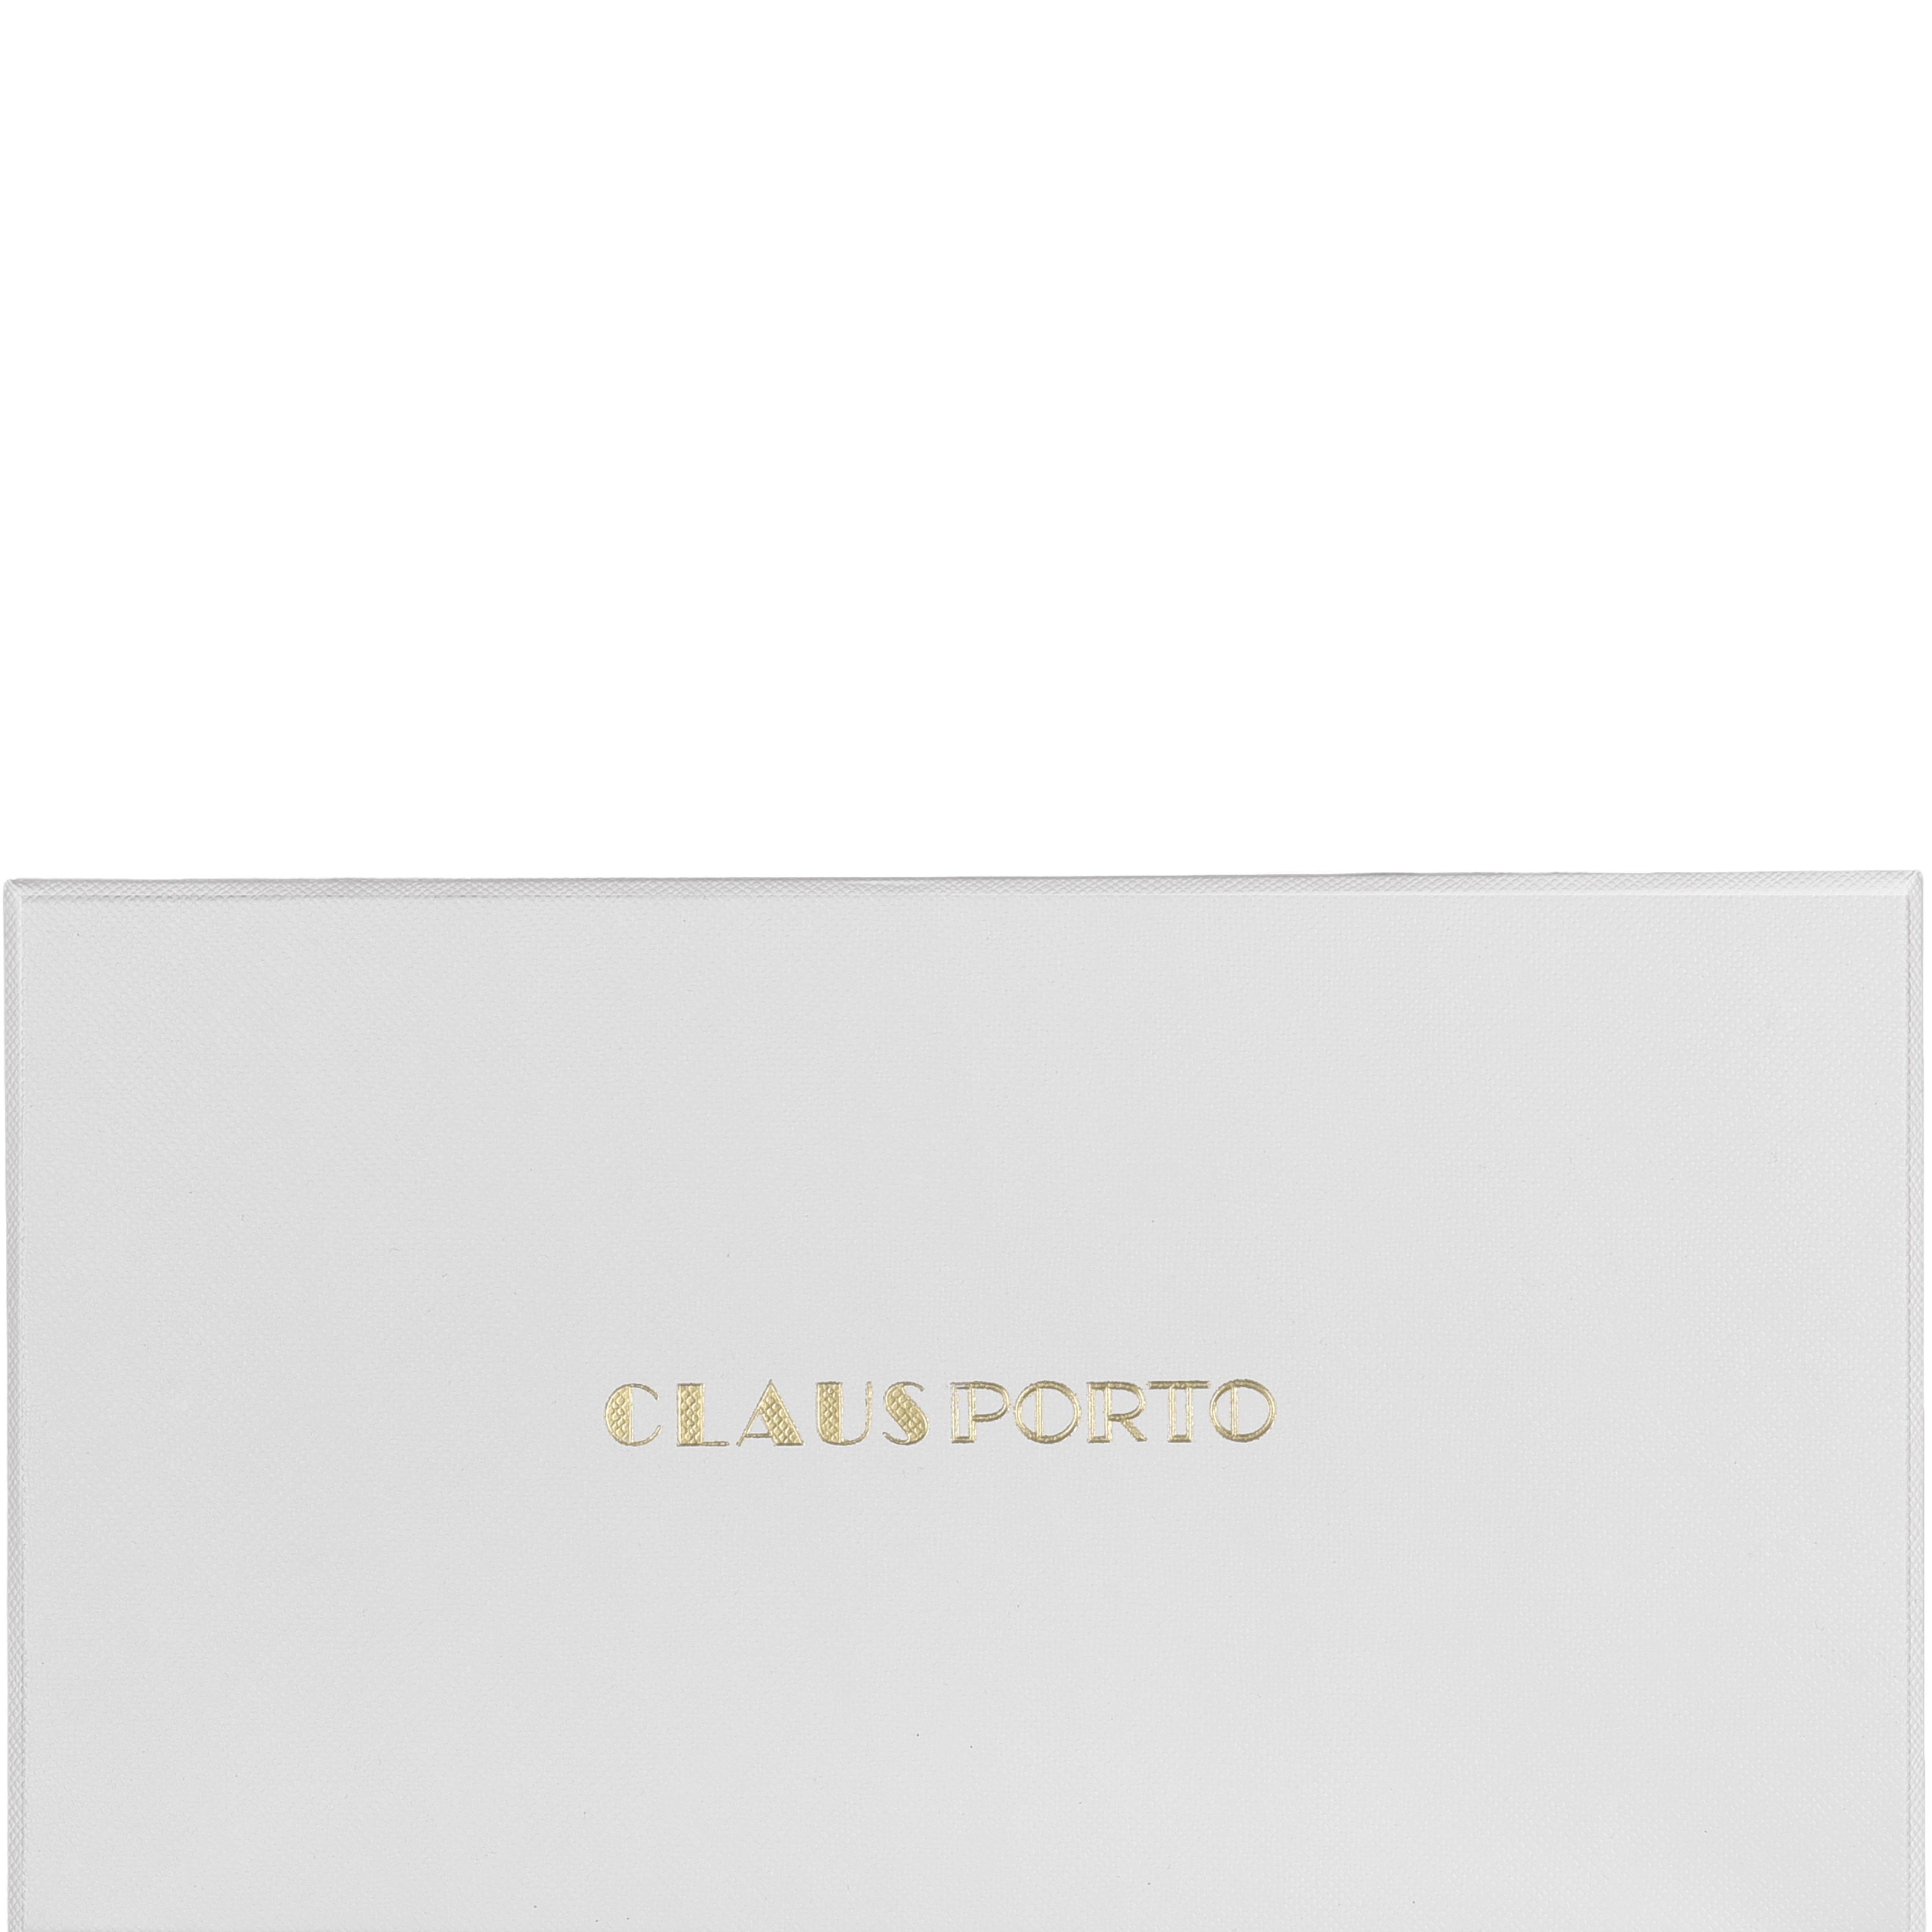 Luxe Gift Box Hand- & Body Soap - Deco